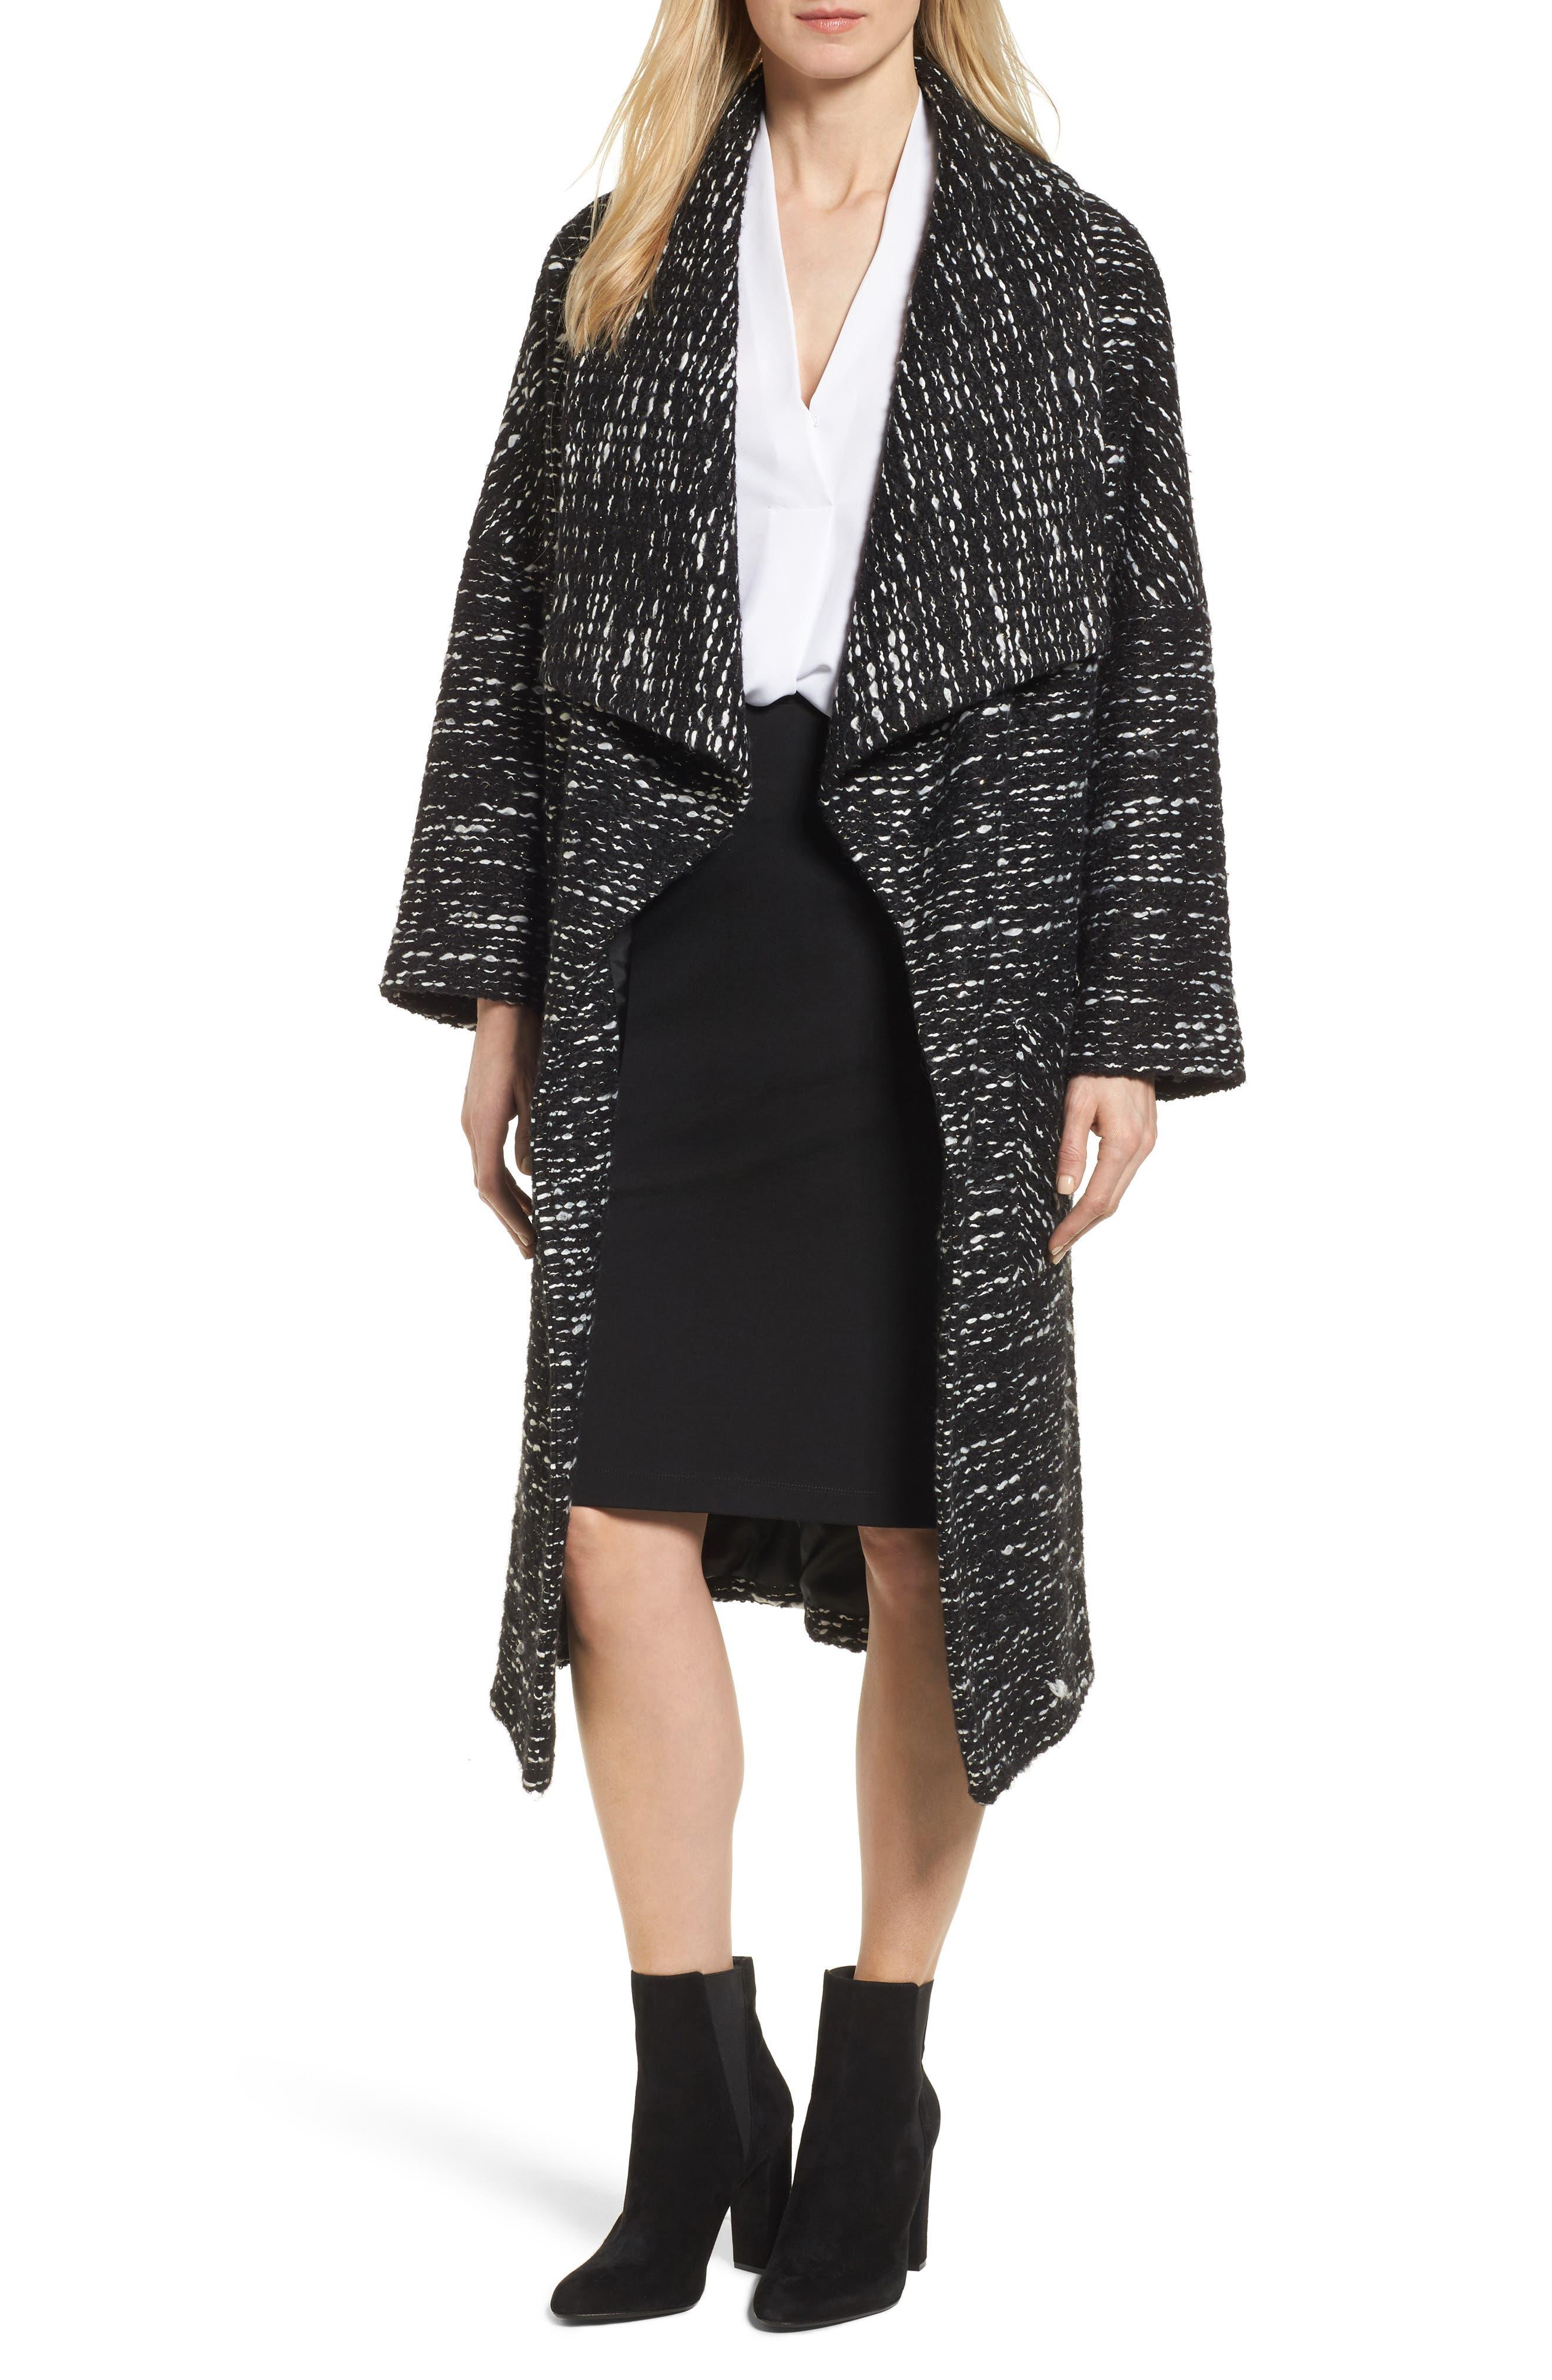 Alternate Image 1 Selected - Charles Gray London Drape Front Long Clutch Coat